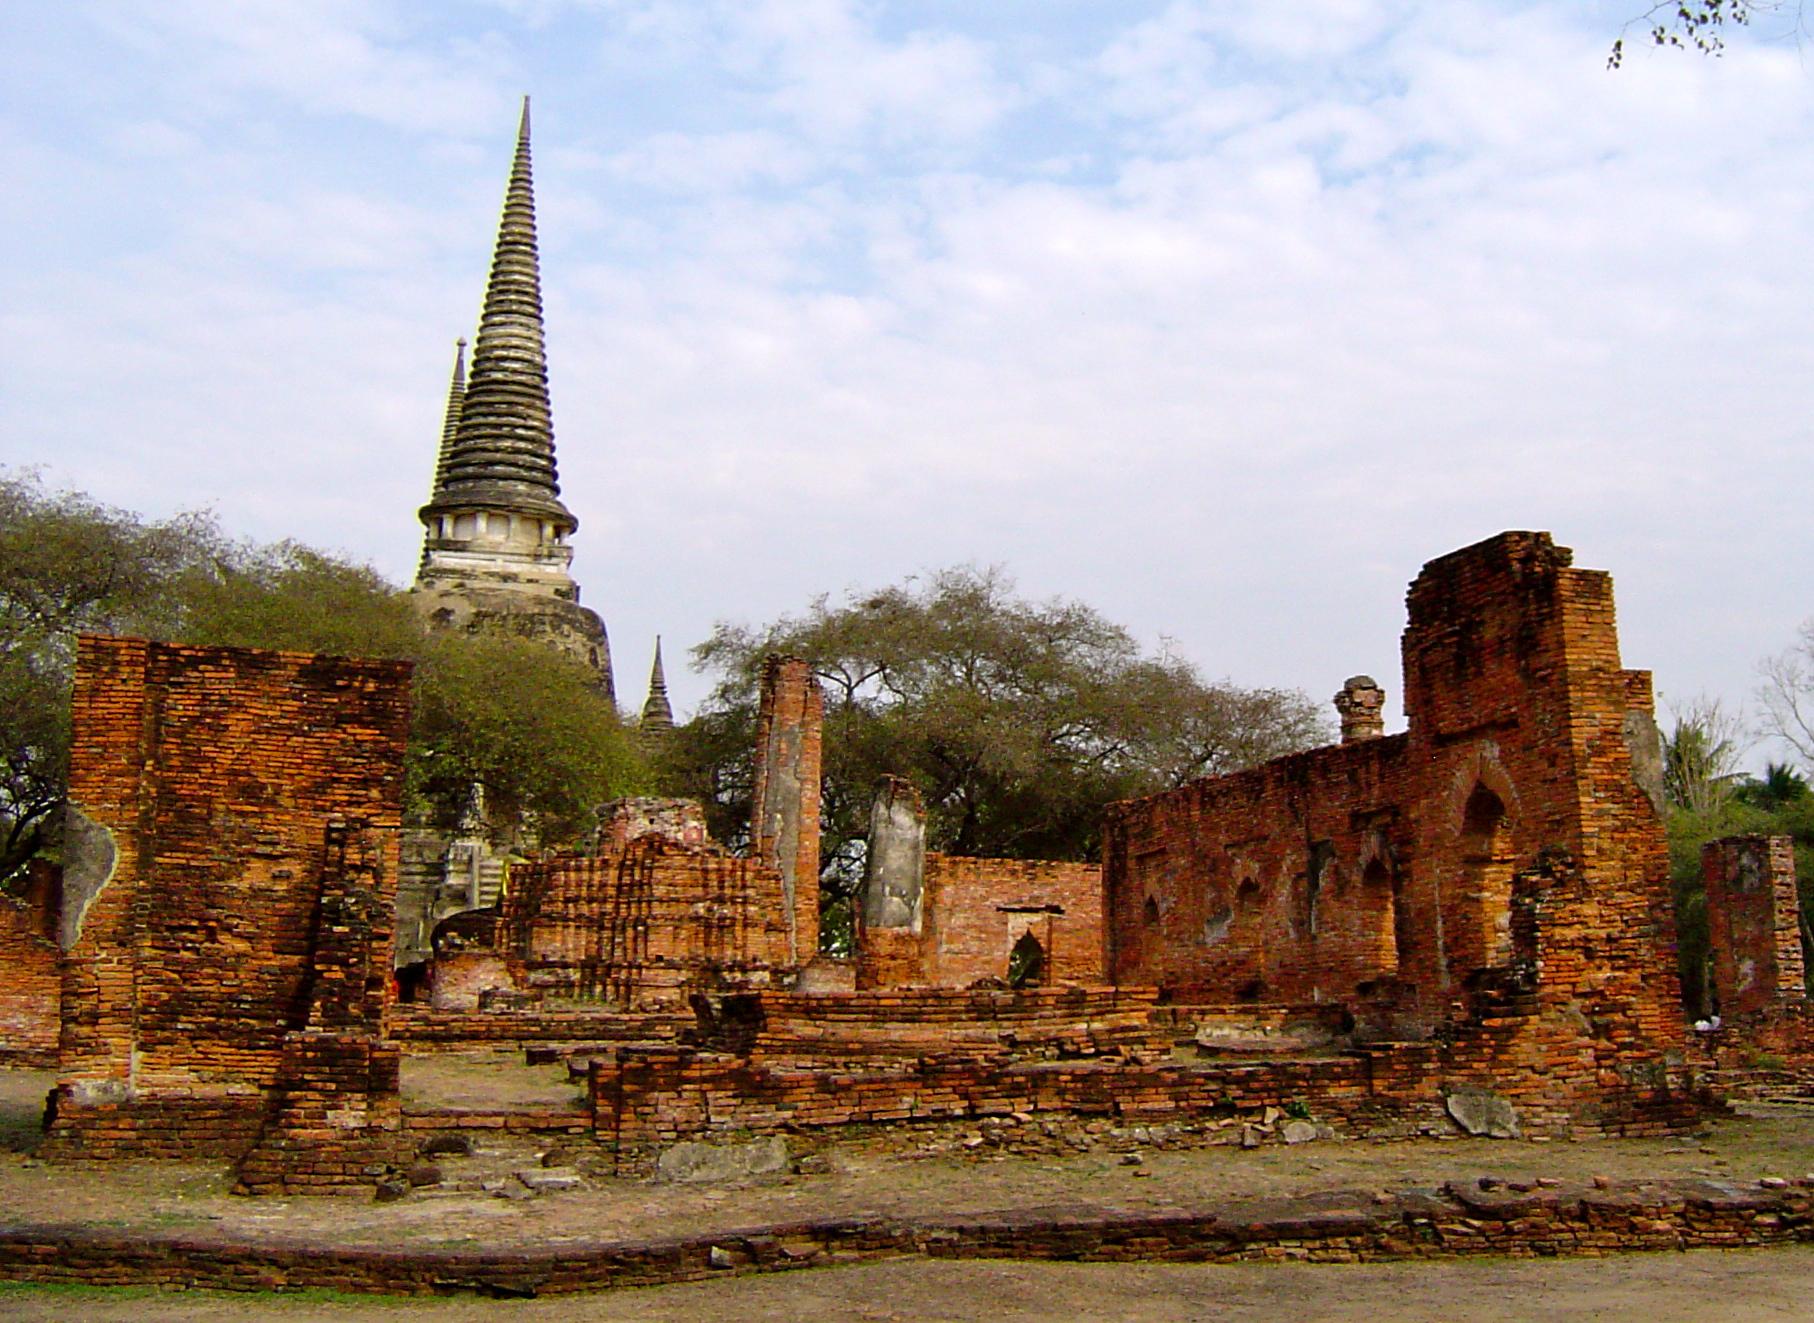 Phra Nakhon Si Ayutthaya Province #